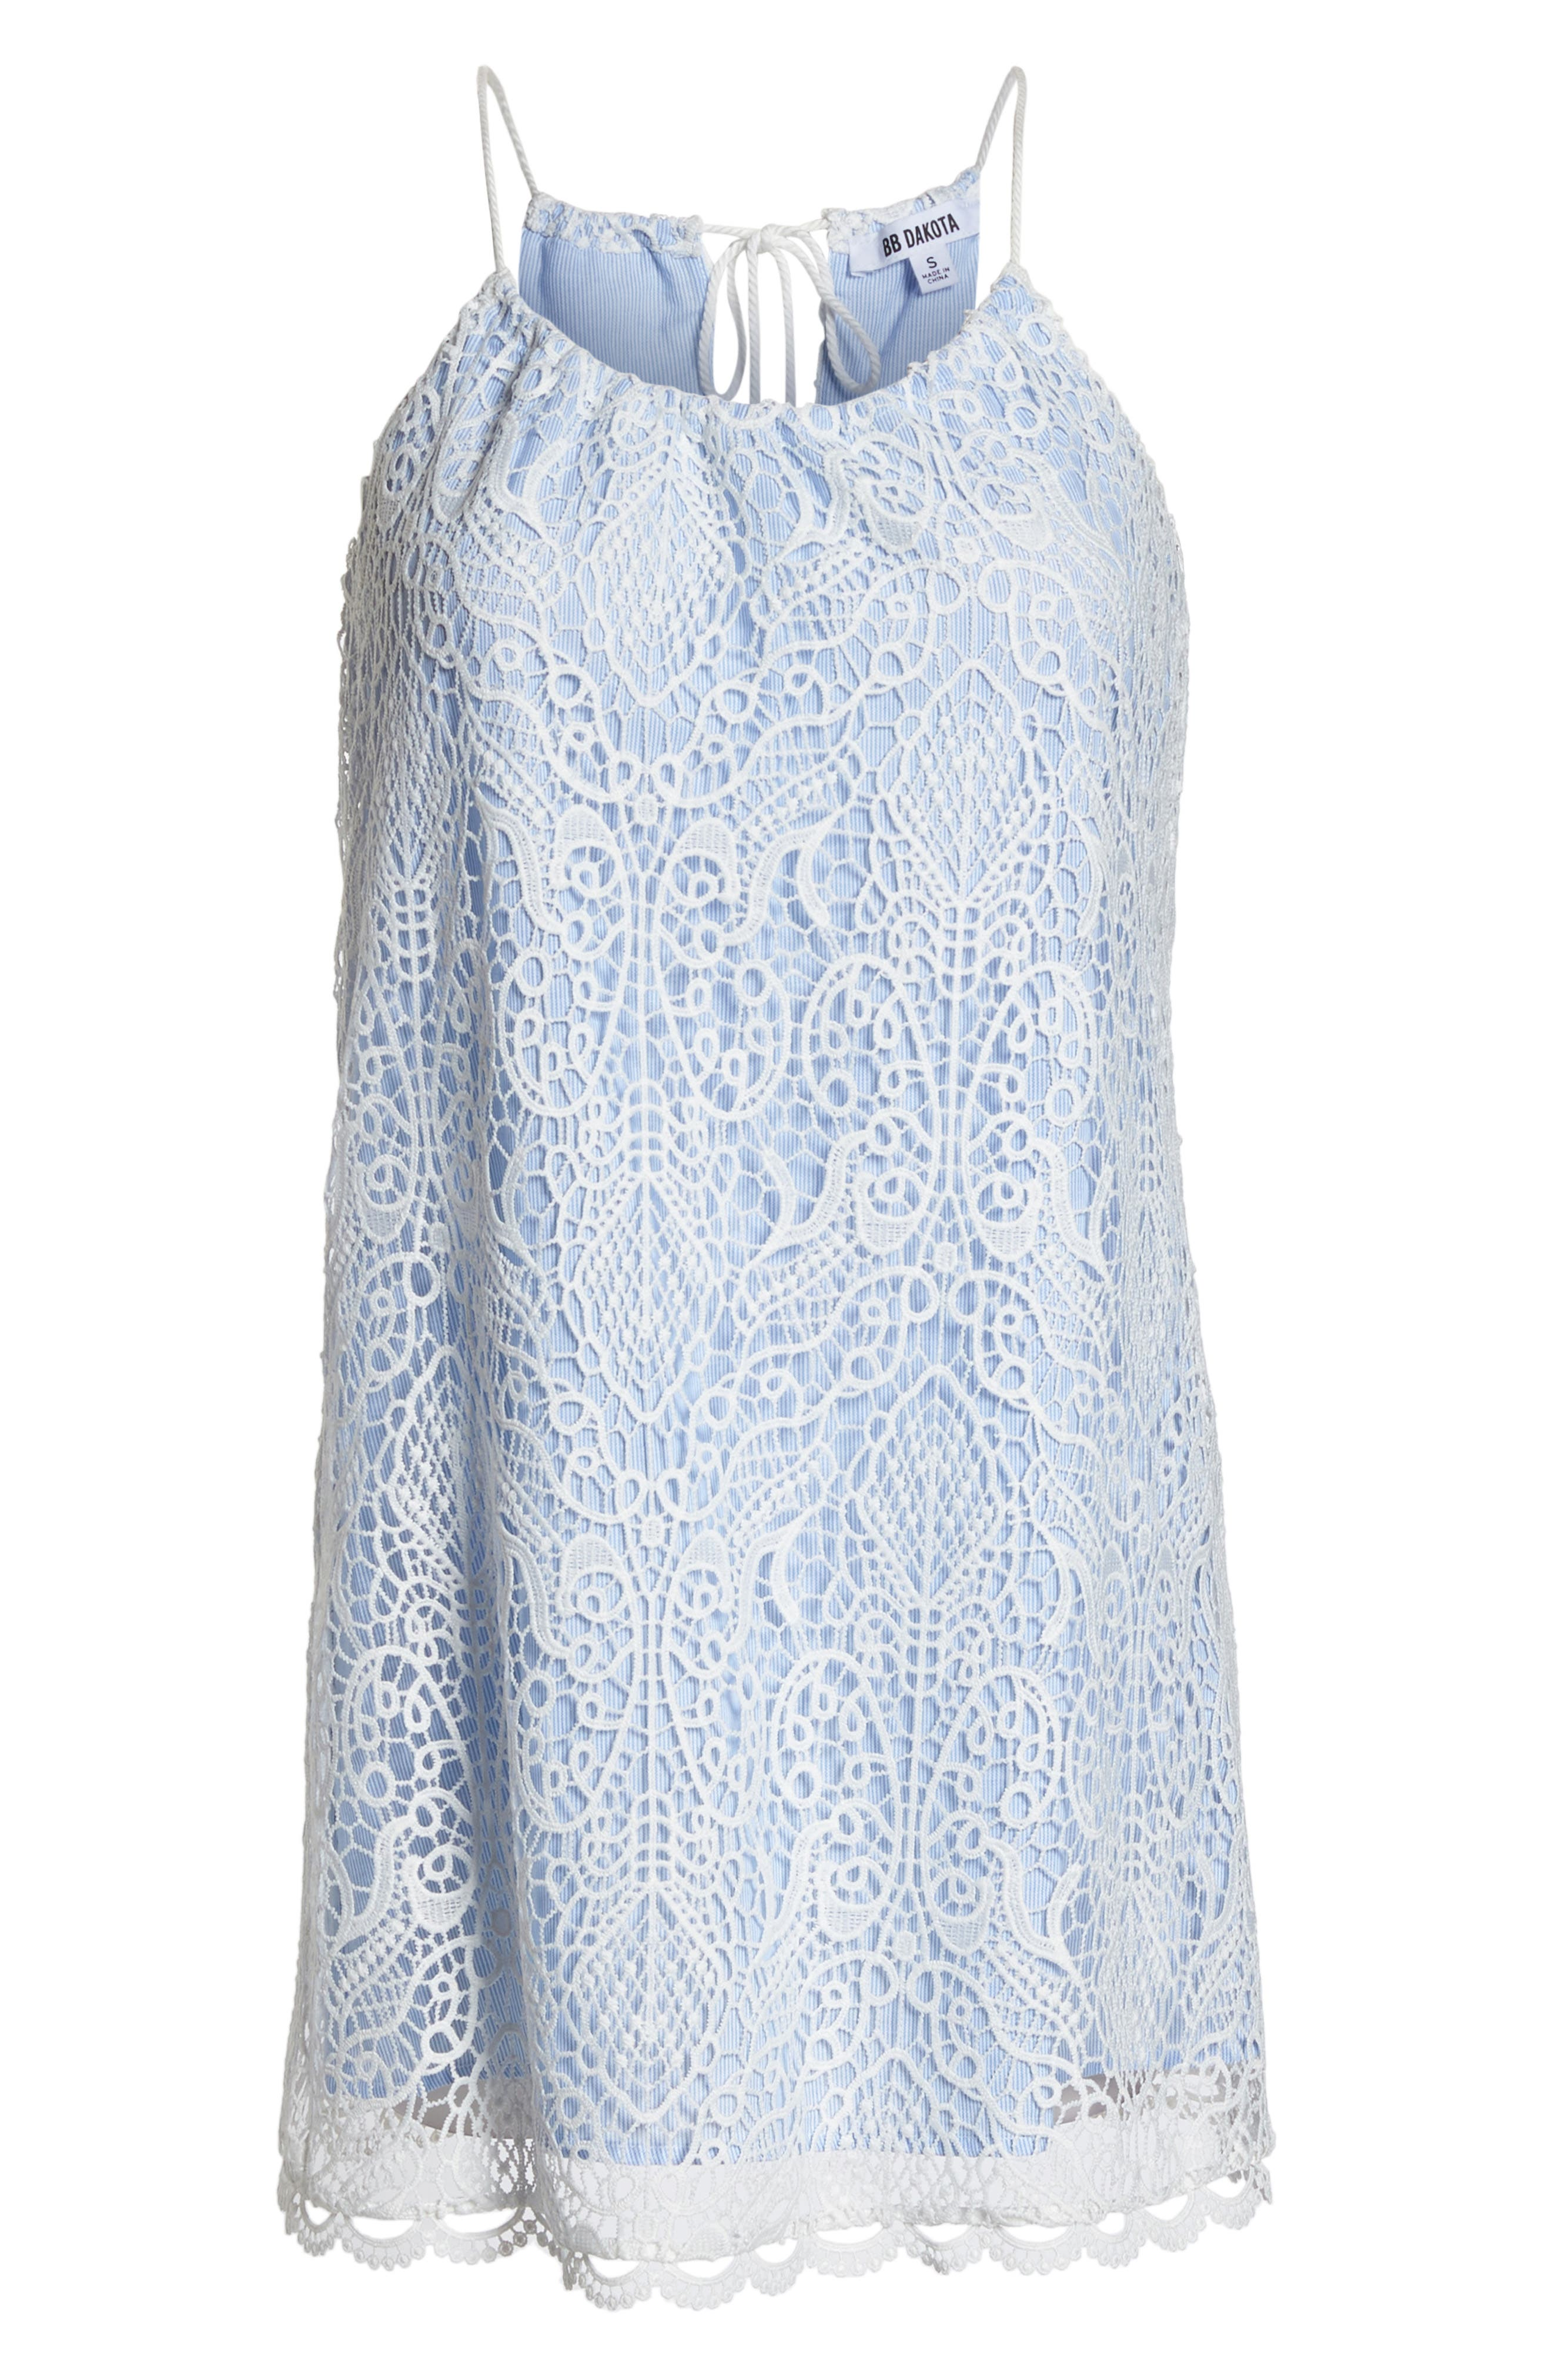 Pinstripe Cotton Lace Shift Dress,                             Alternate thumbnail 7, color,